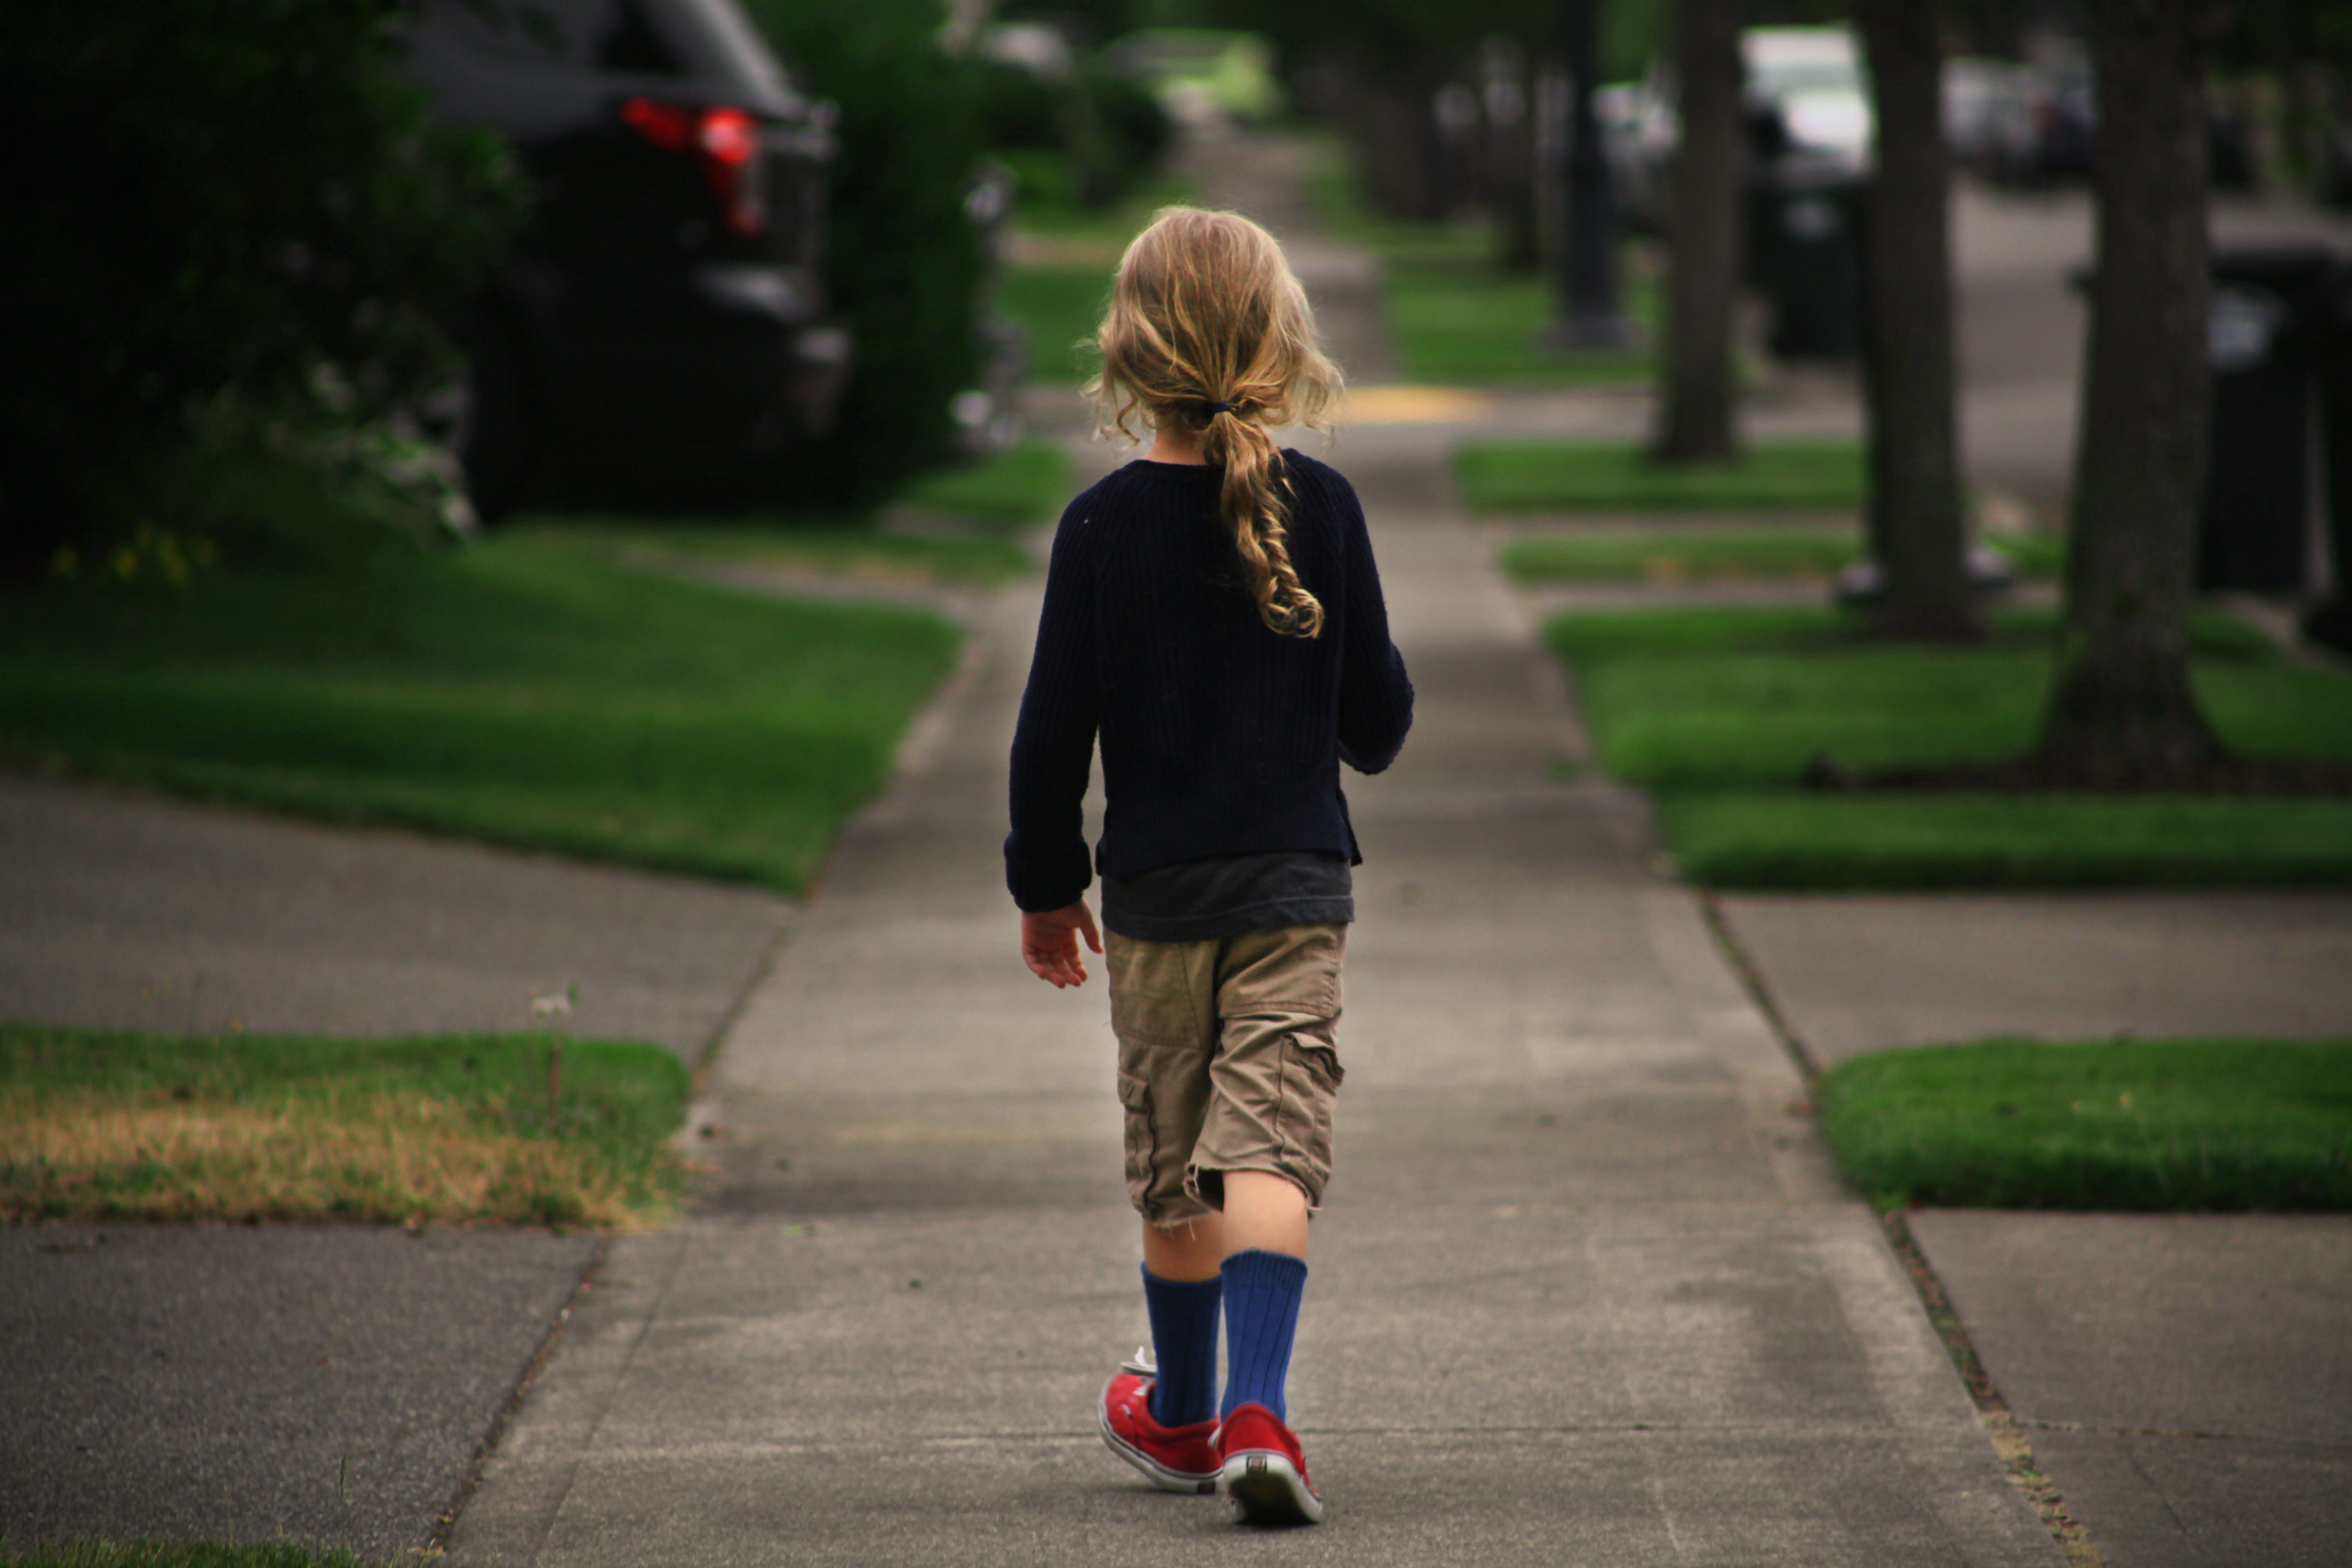 Free stock photo of boy walking sidewalk street